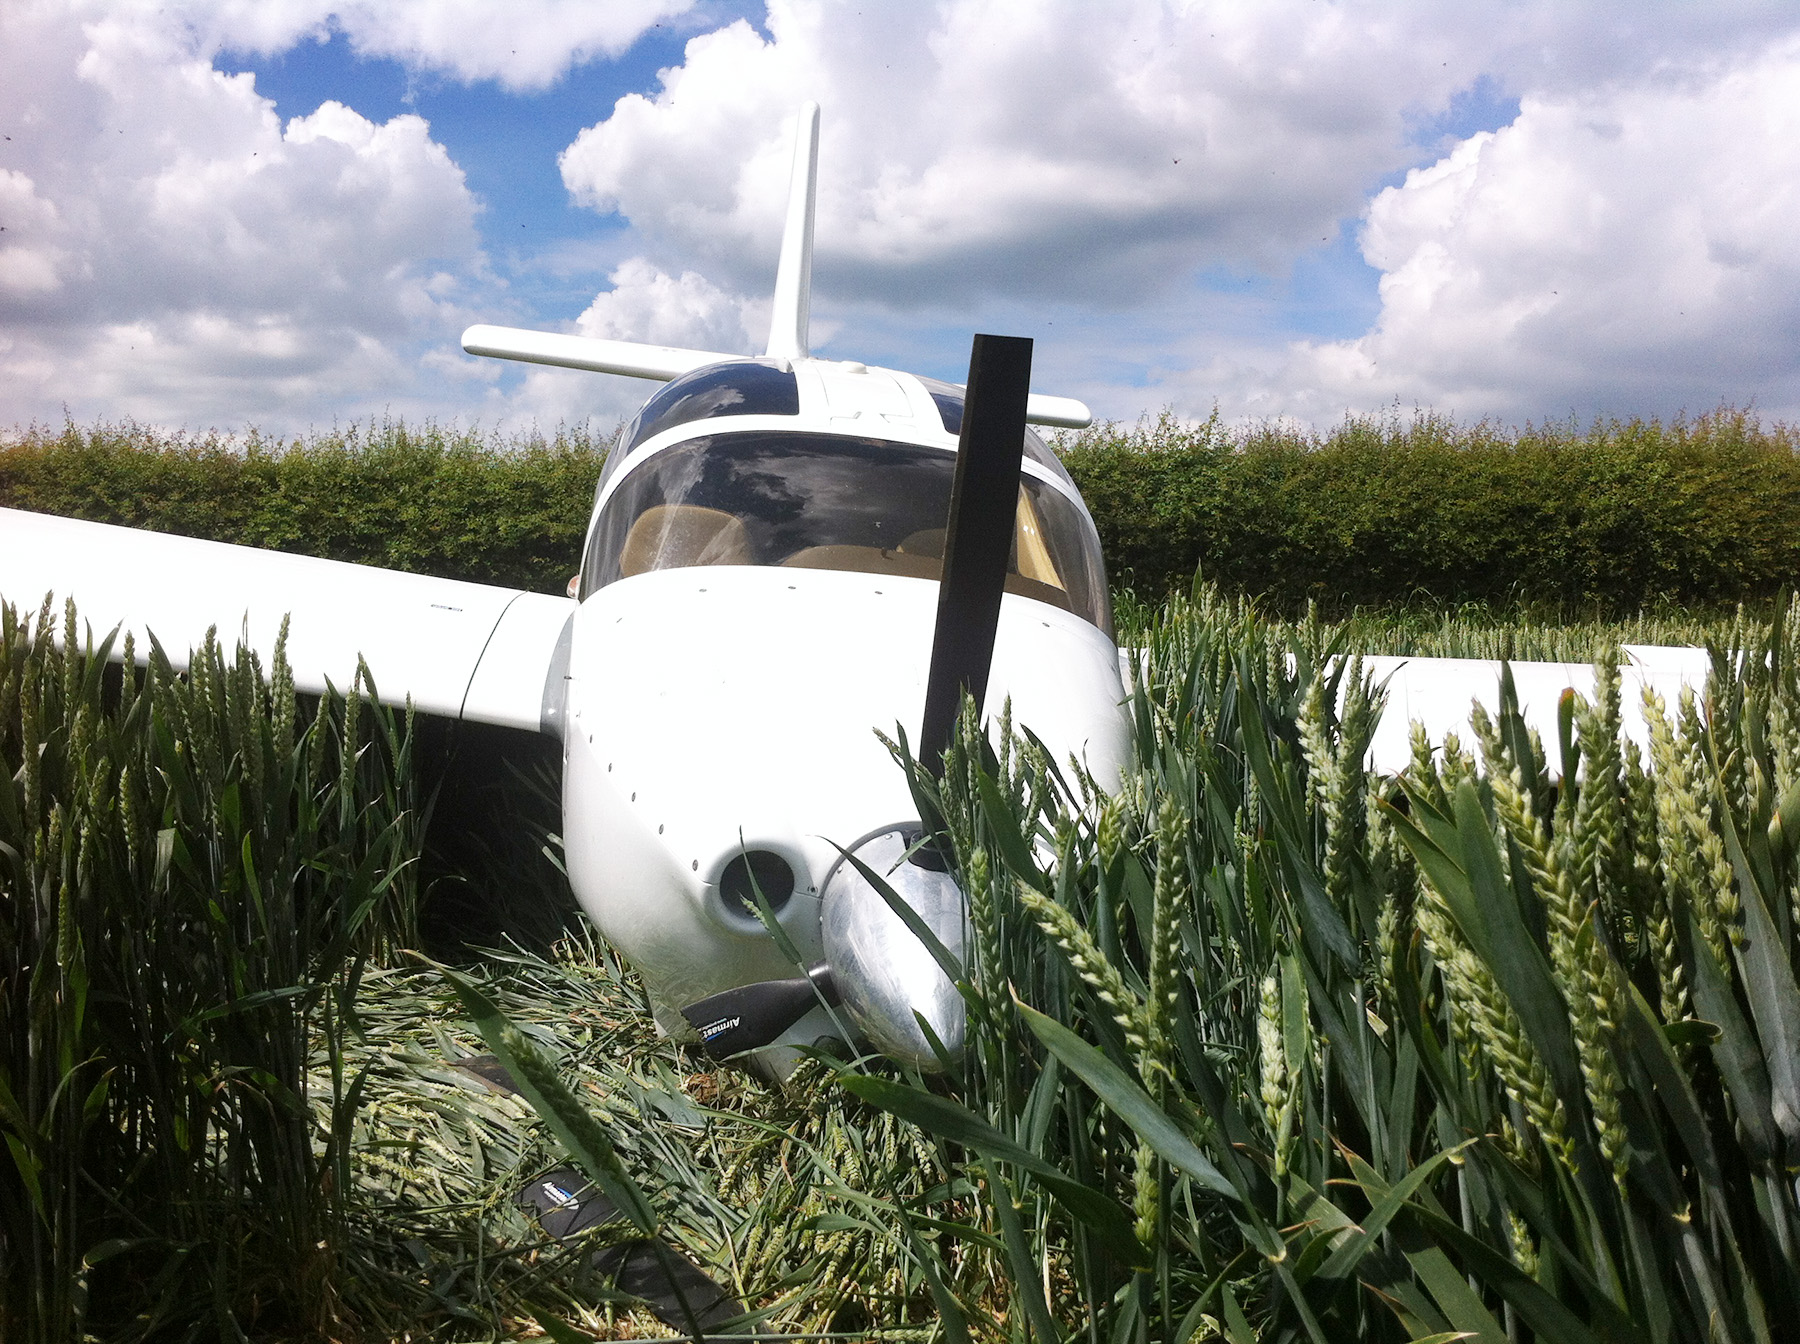 Maidwell Plane Crash